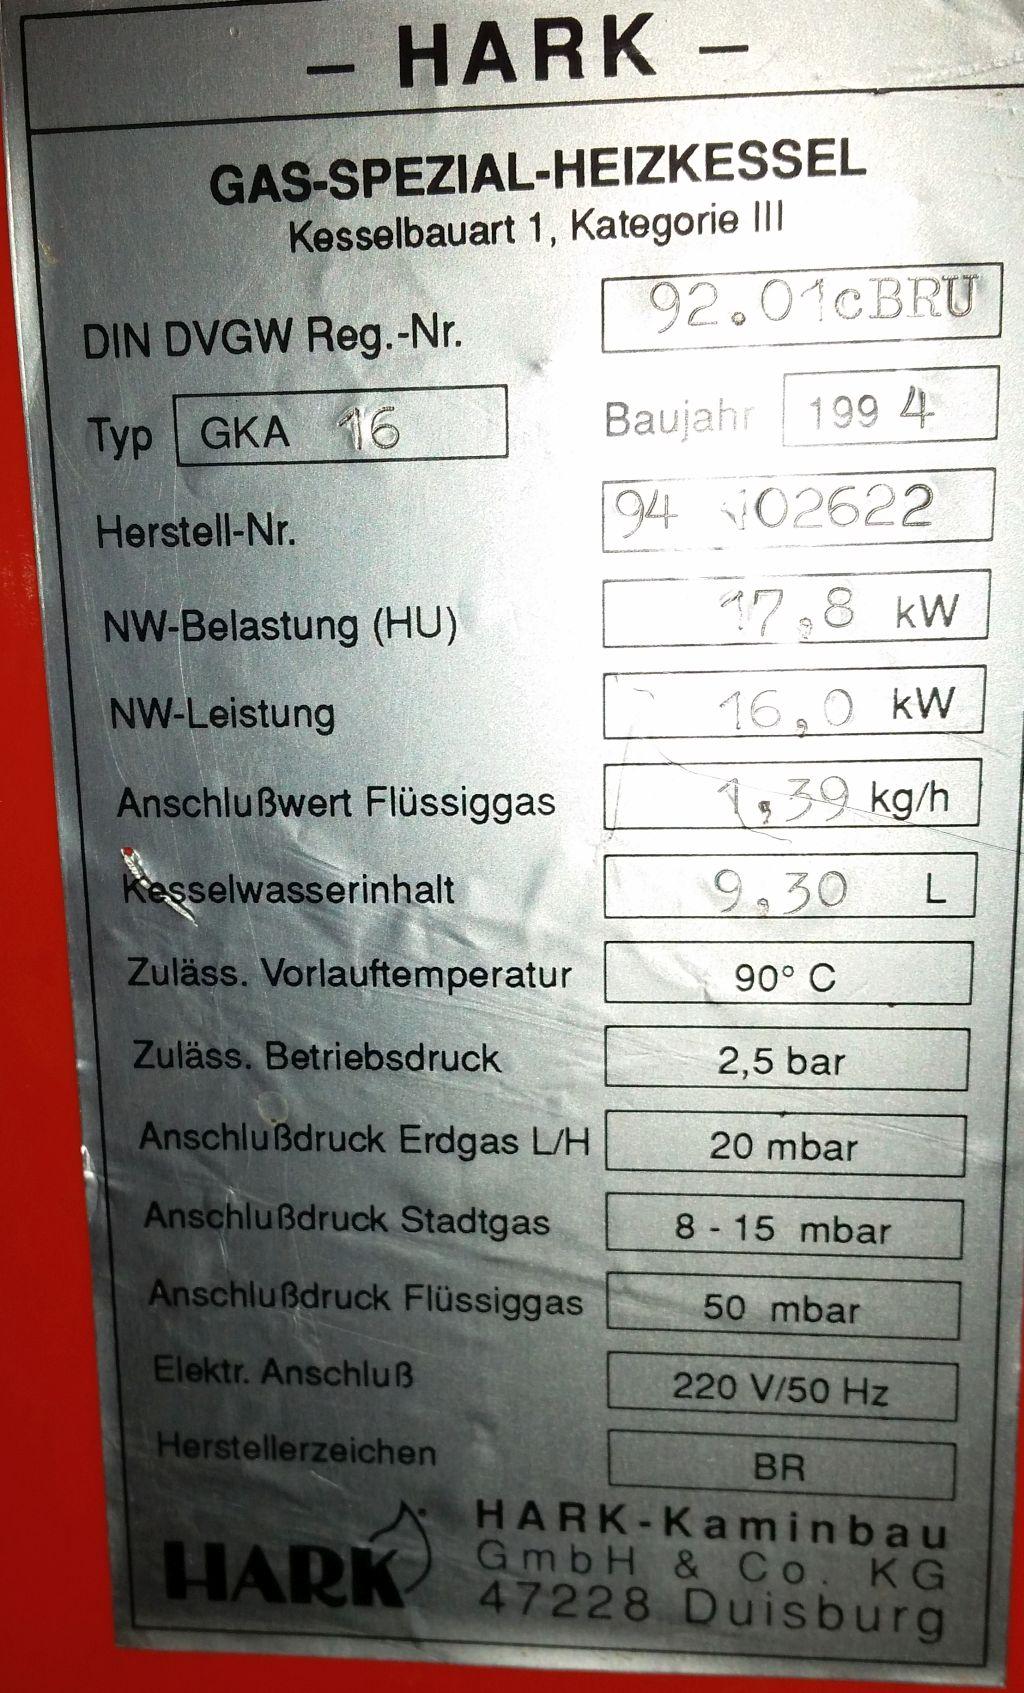 Taupunkt vs. O2/CO2 vs. Sockeltemperatur: Brennwert reverse ...